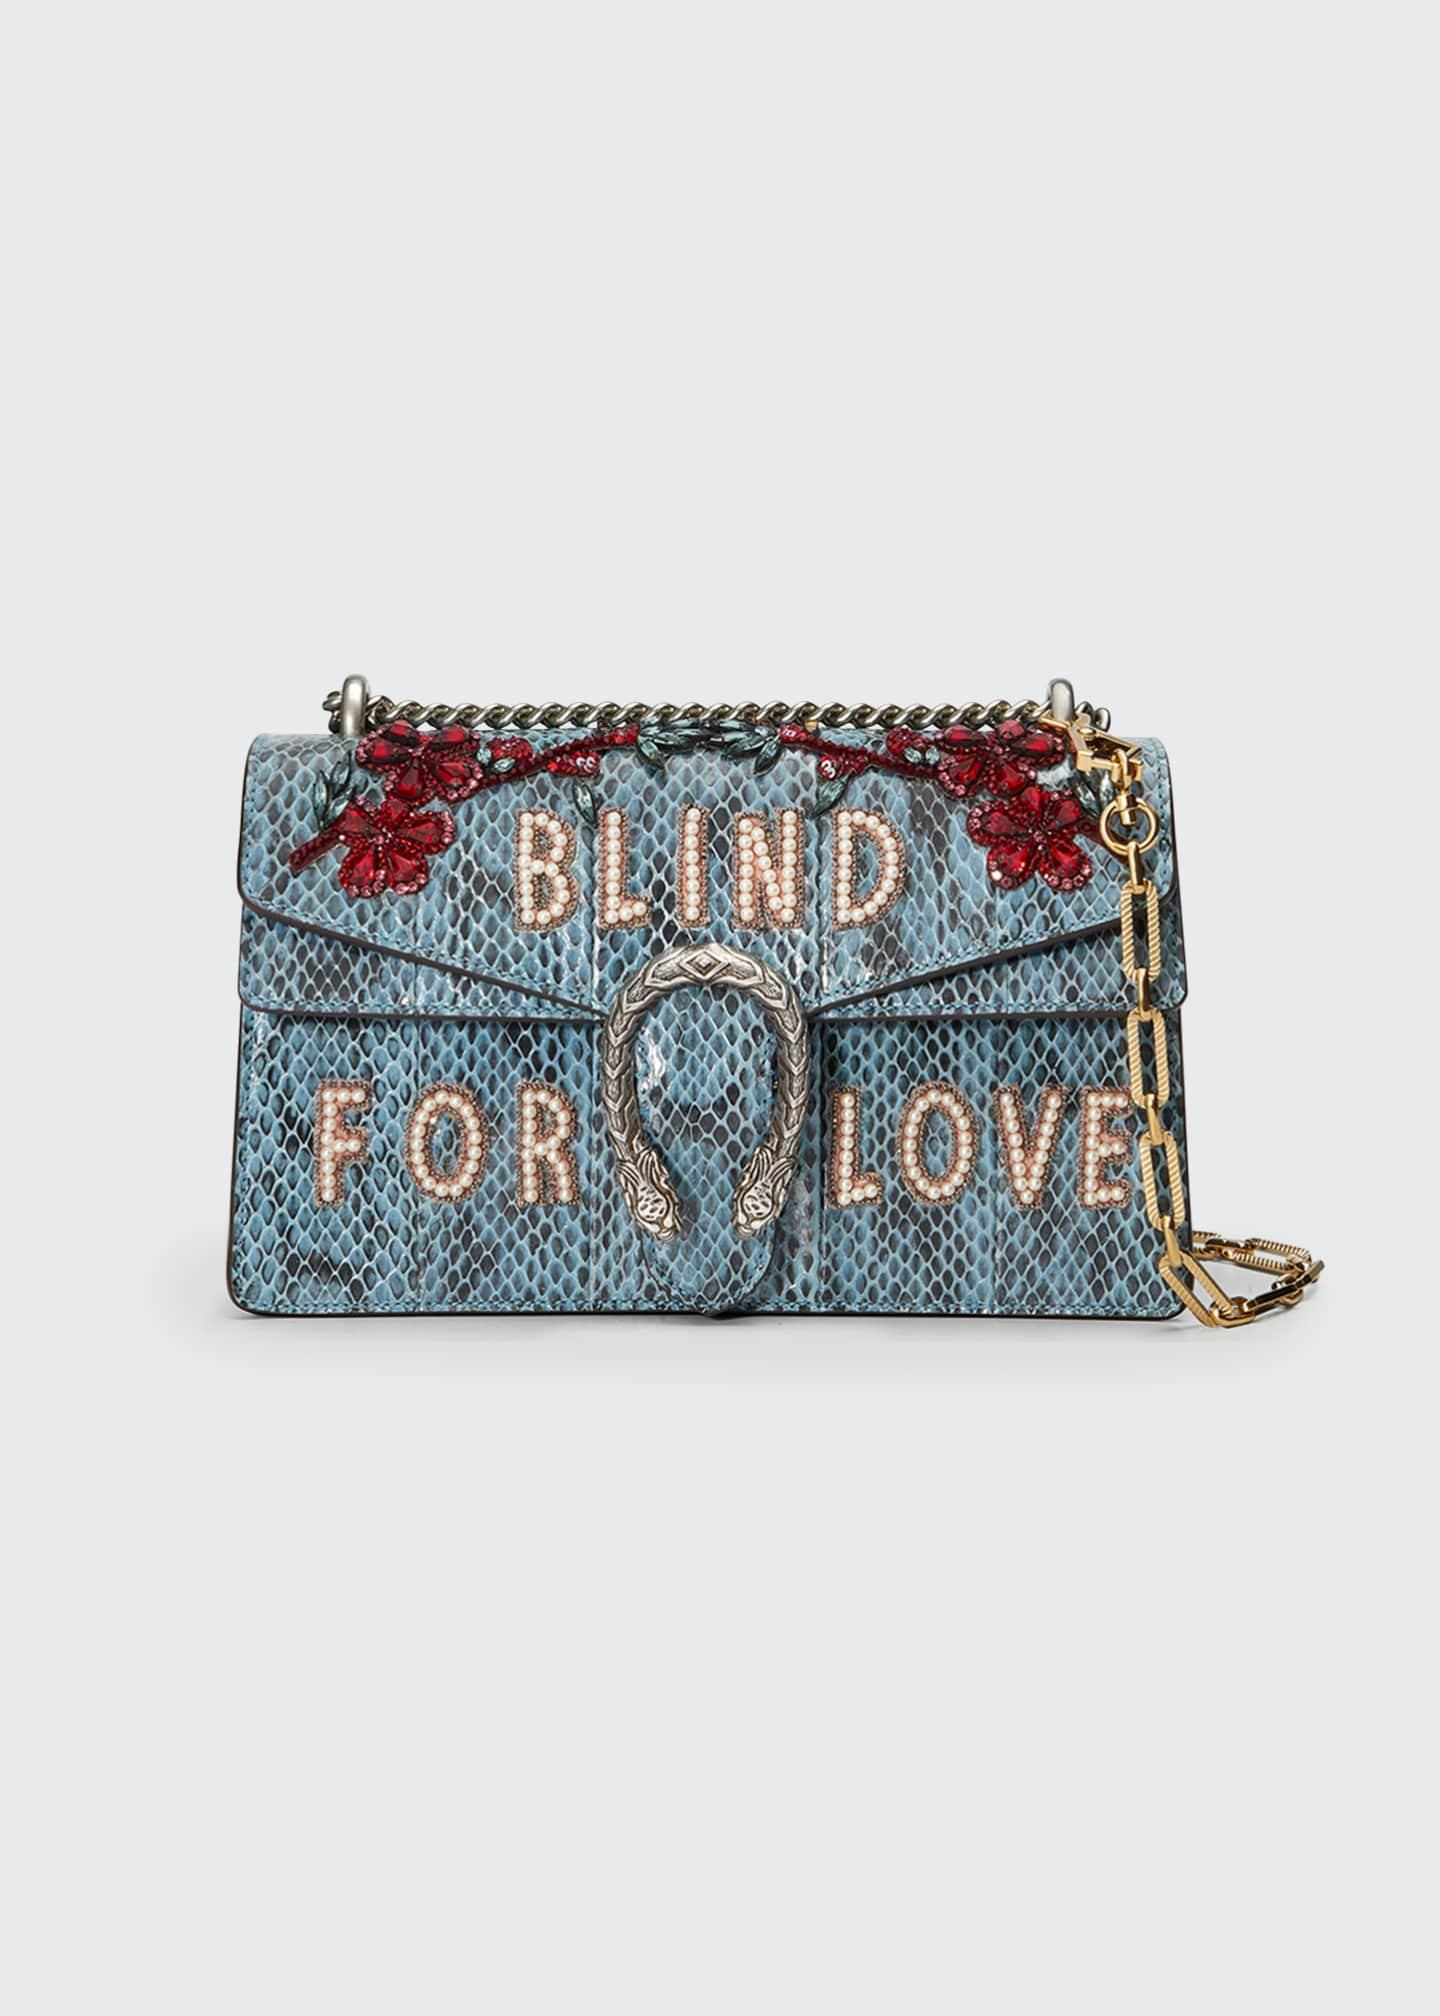 Gucci Dionysus Small Blind For Love Shoulder Bag,